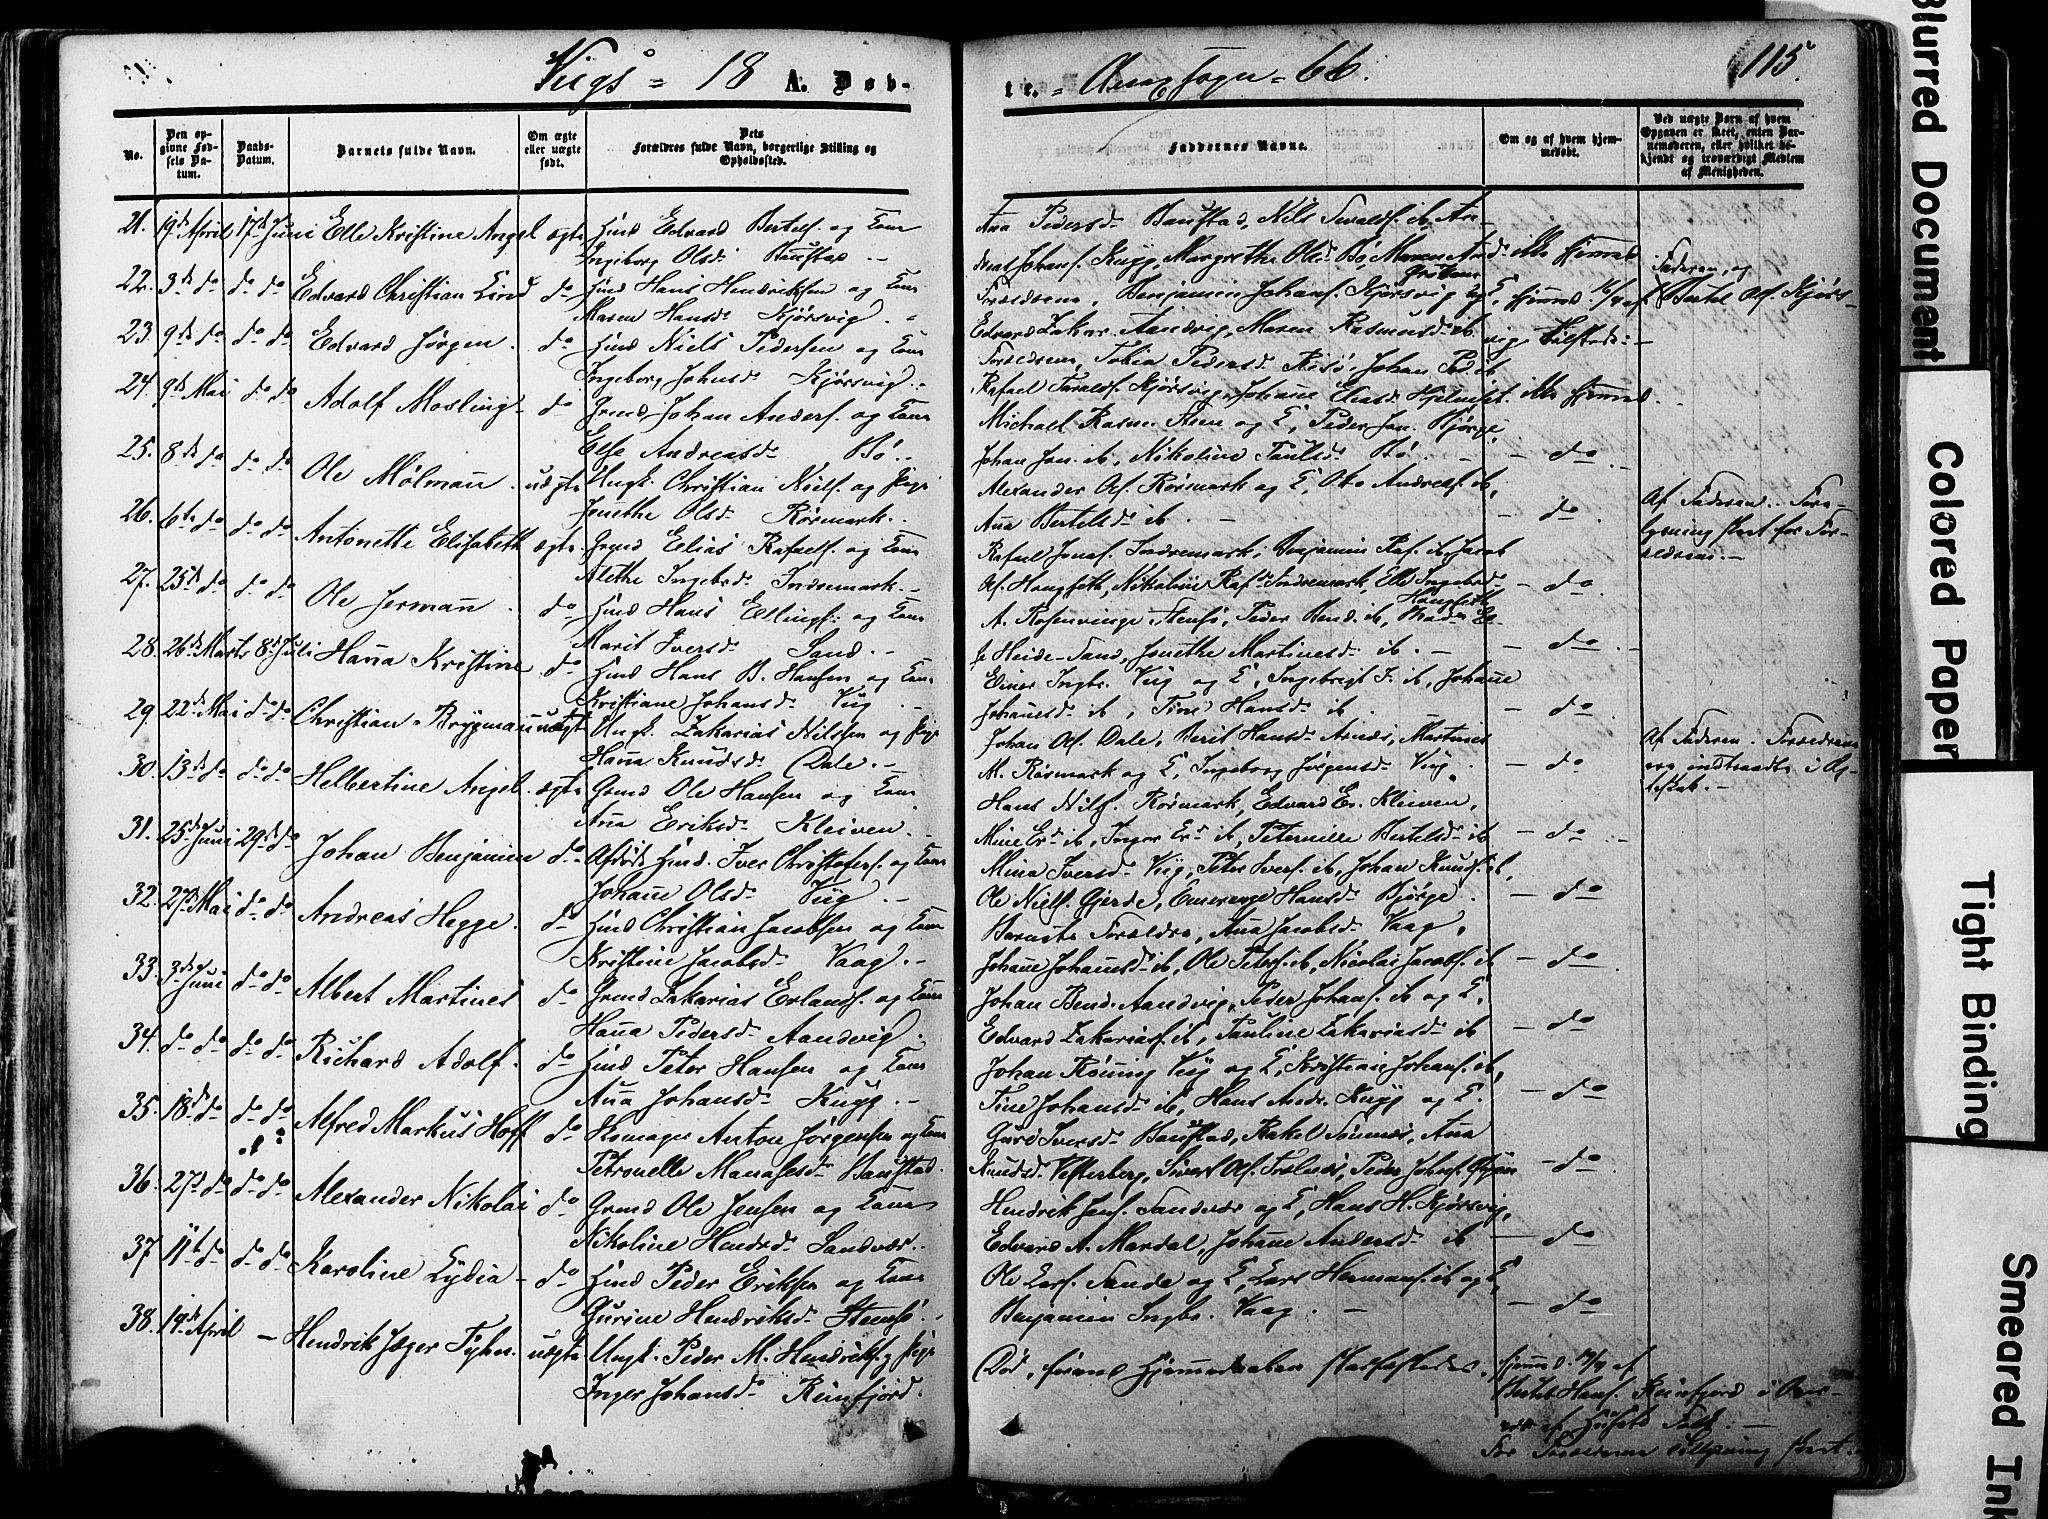 SAT, Ministerialprotokoller, klokkerbøker og fødselsregistre - Nordland, 812/L0176: Ministerialbok nr. 812A05, 1834-1874, s. 115